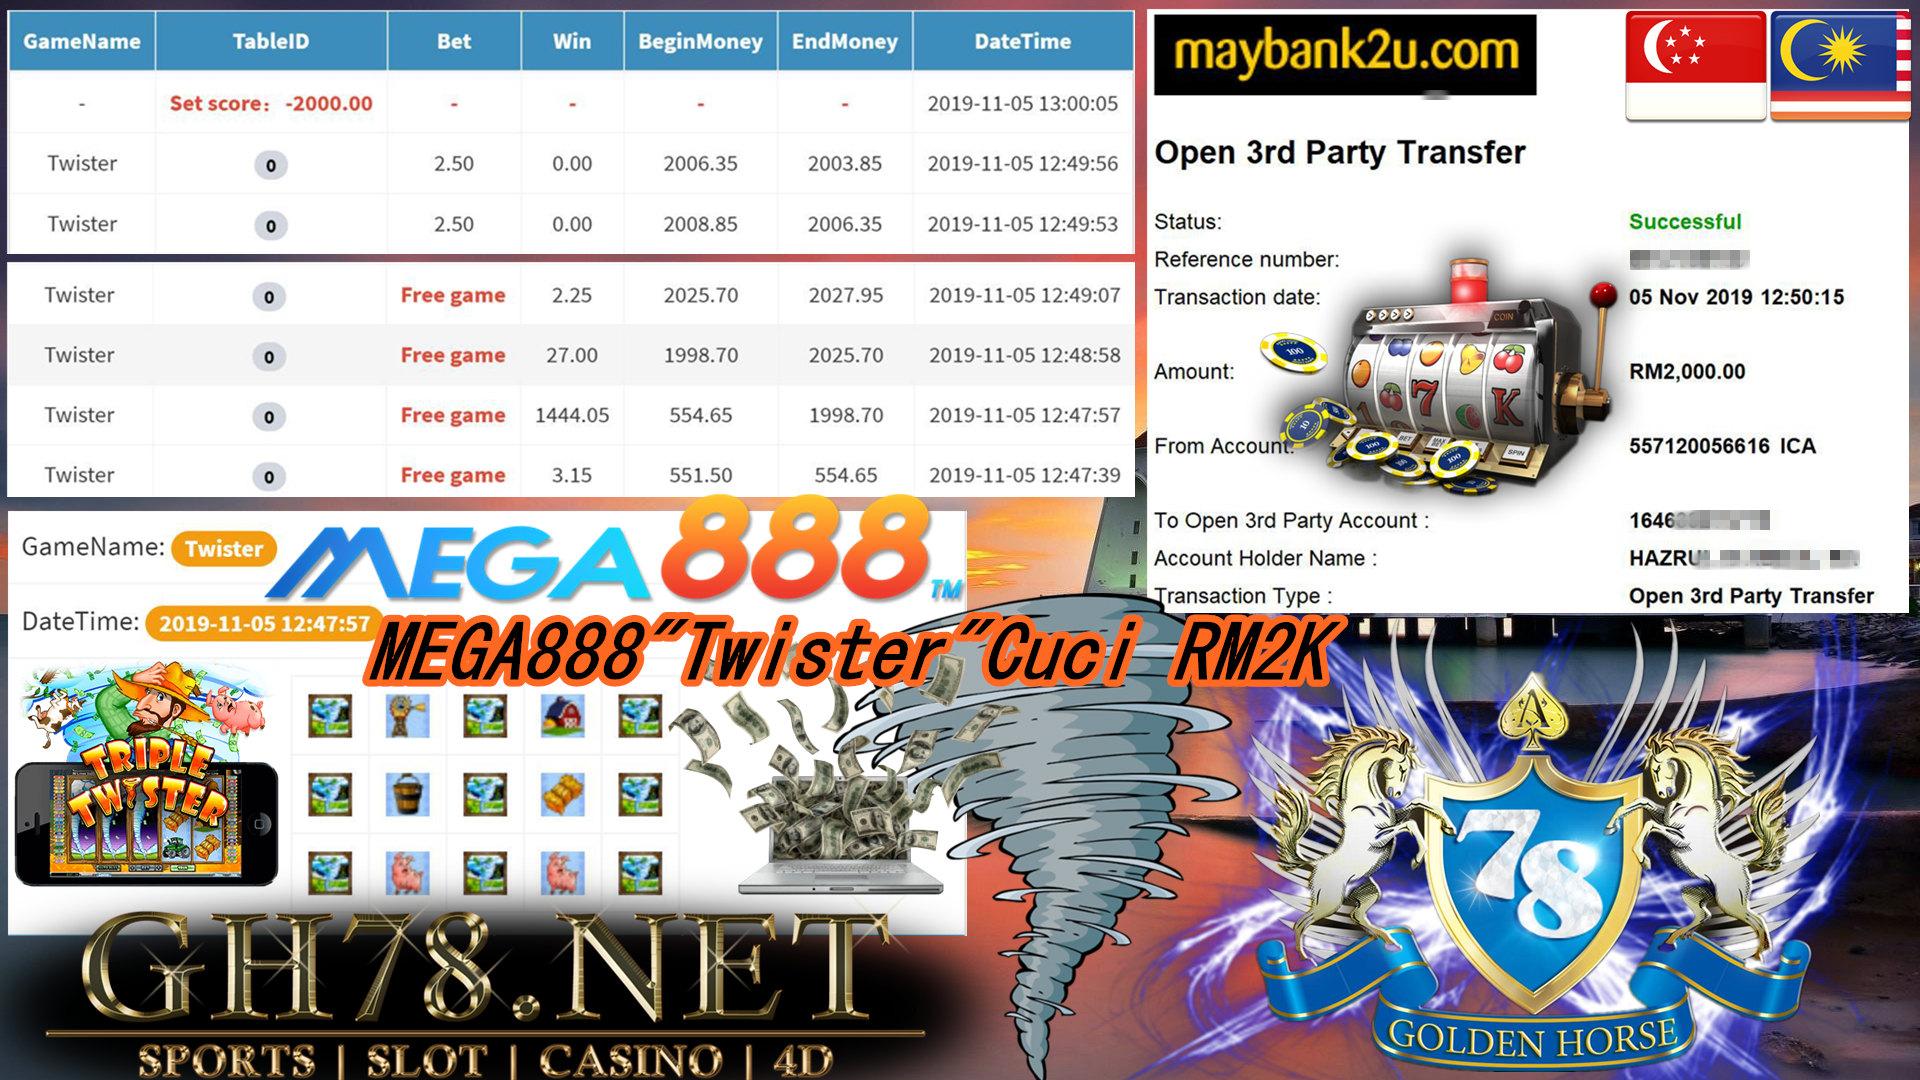 MEGA888 CUSTOMER MAIN TWISTER MINTA CUCI RM2000!!